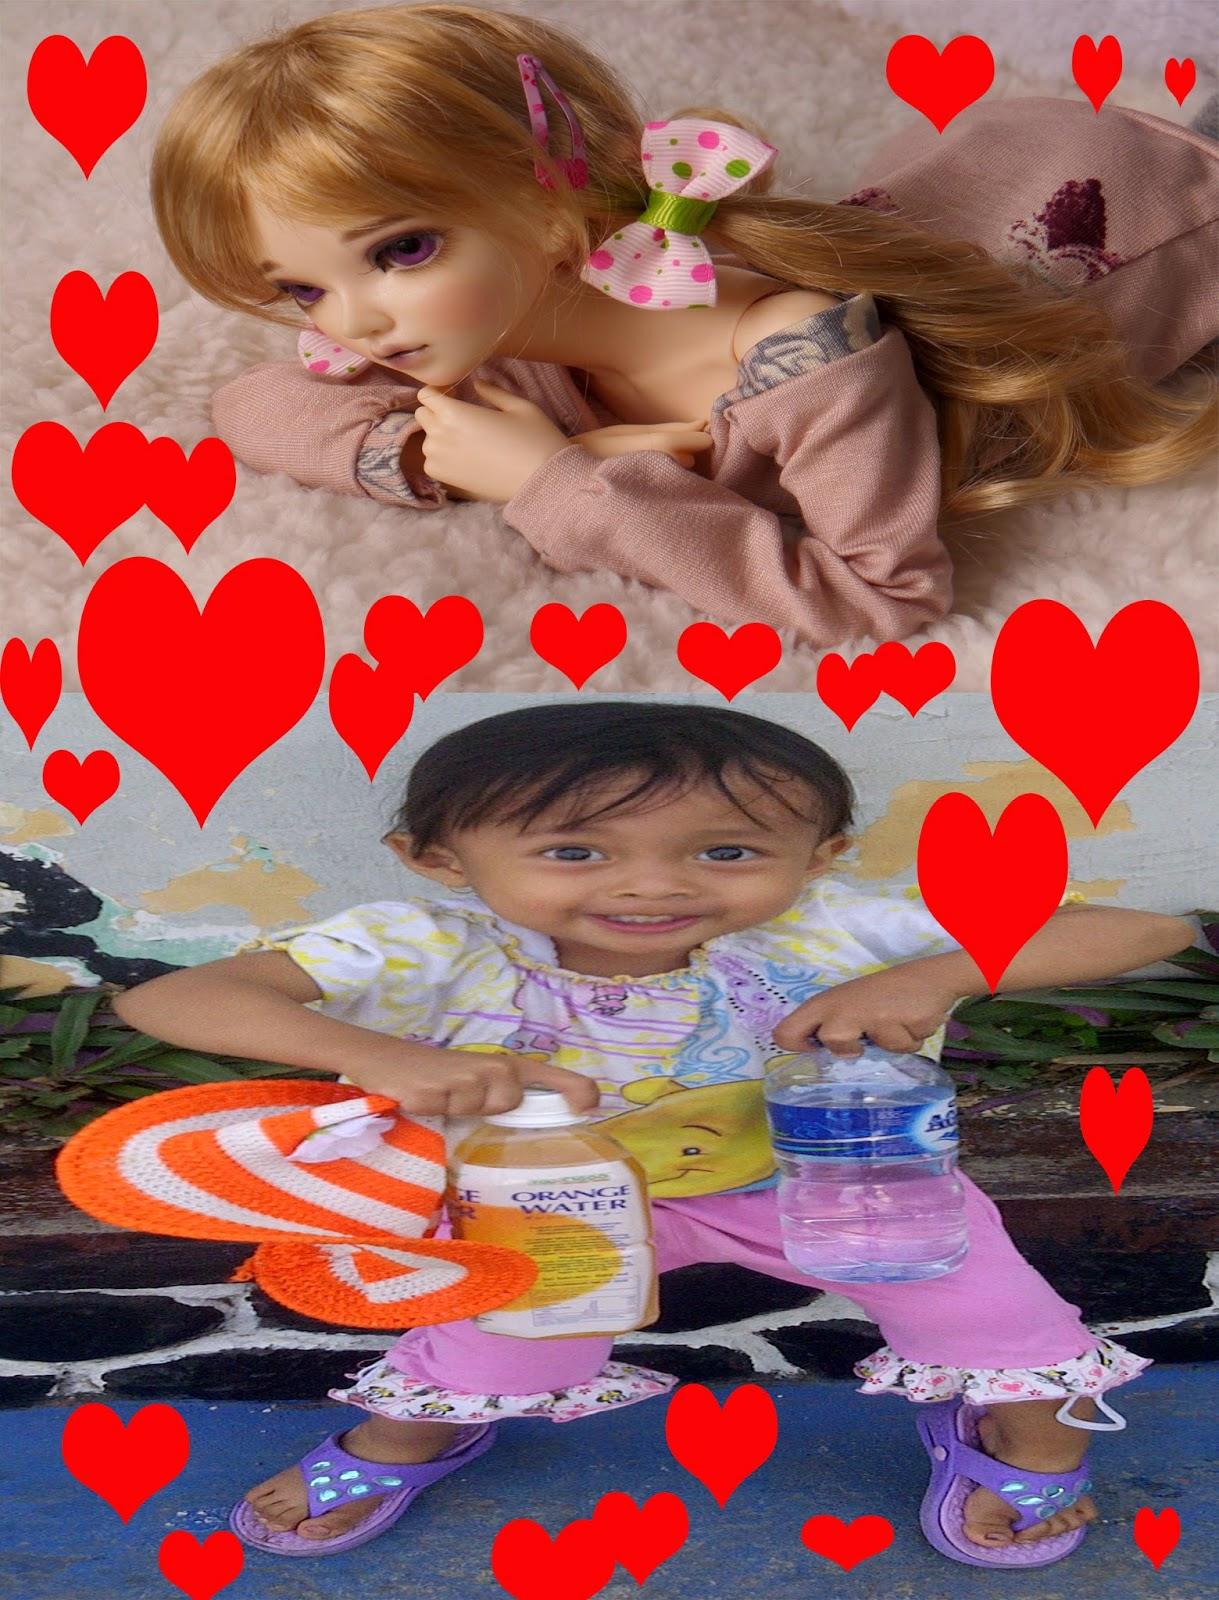 anak perempuan mengidolakan boneka barbie